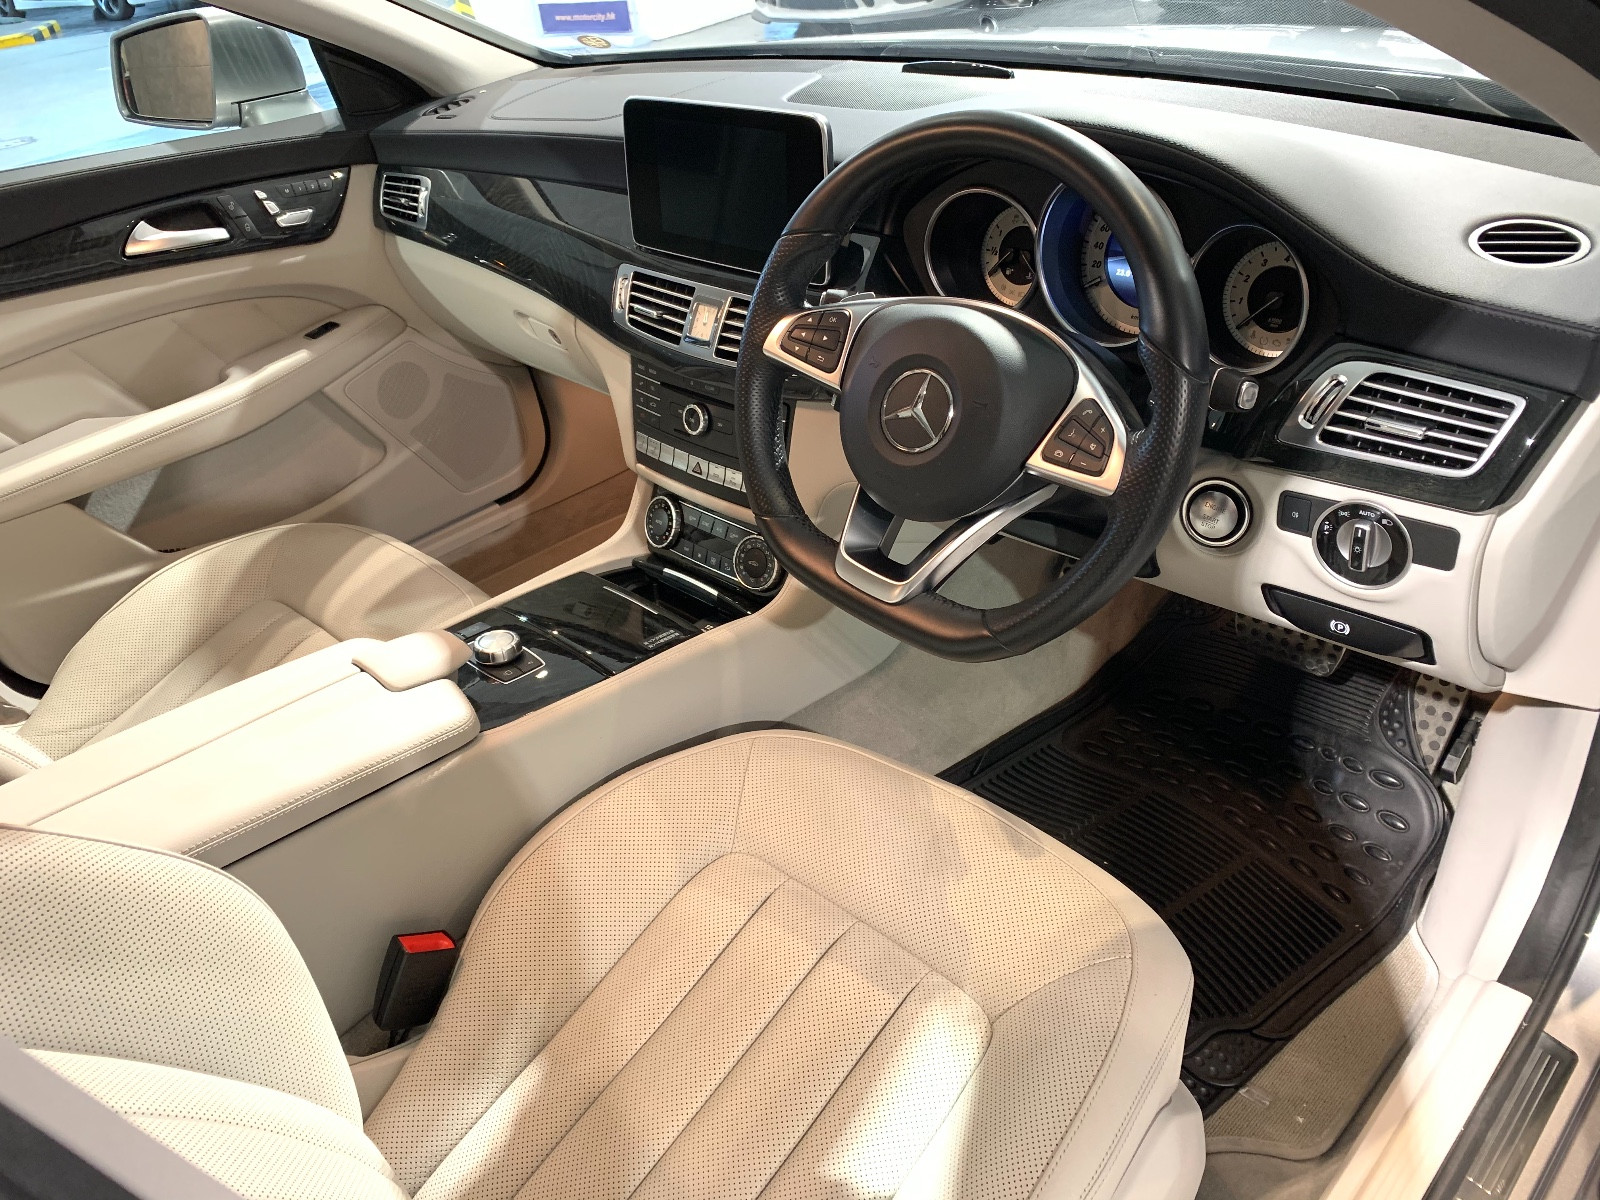 Mercedes-Benz CLS400 AMG - Image 3